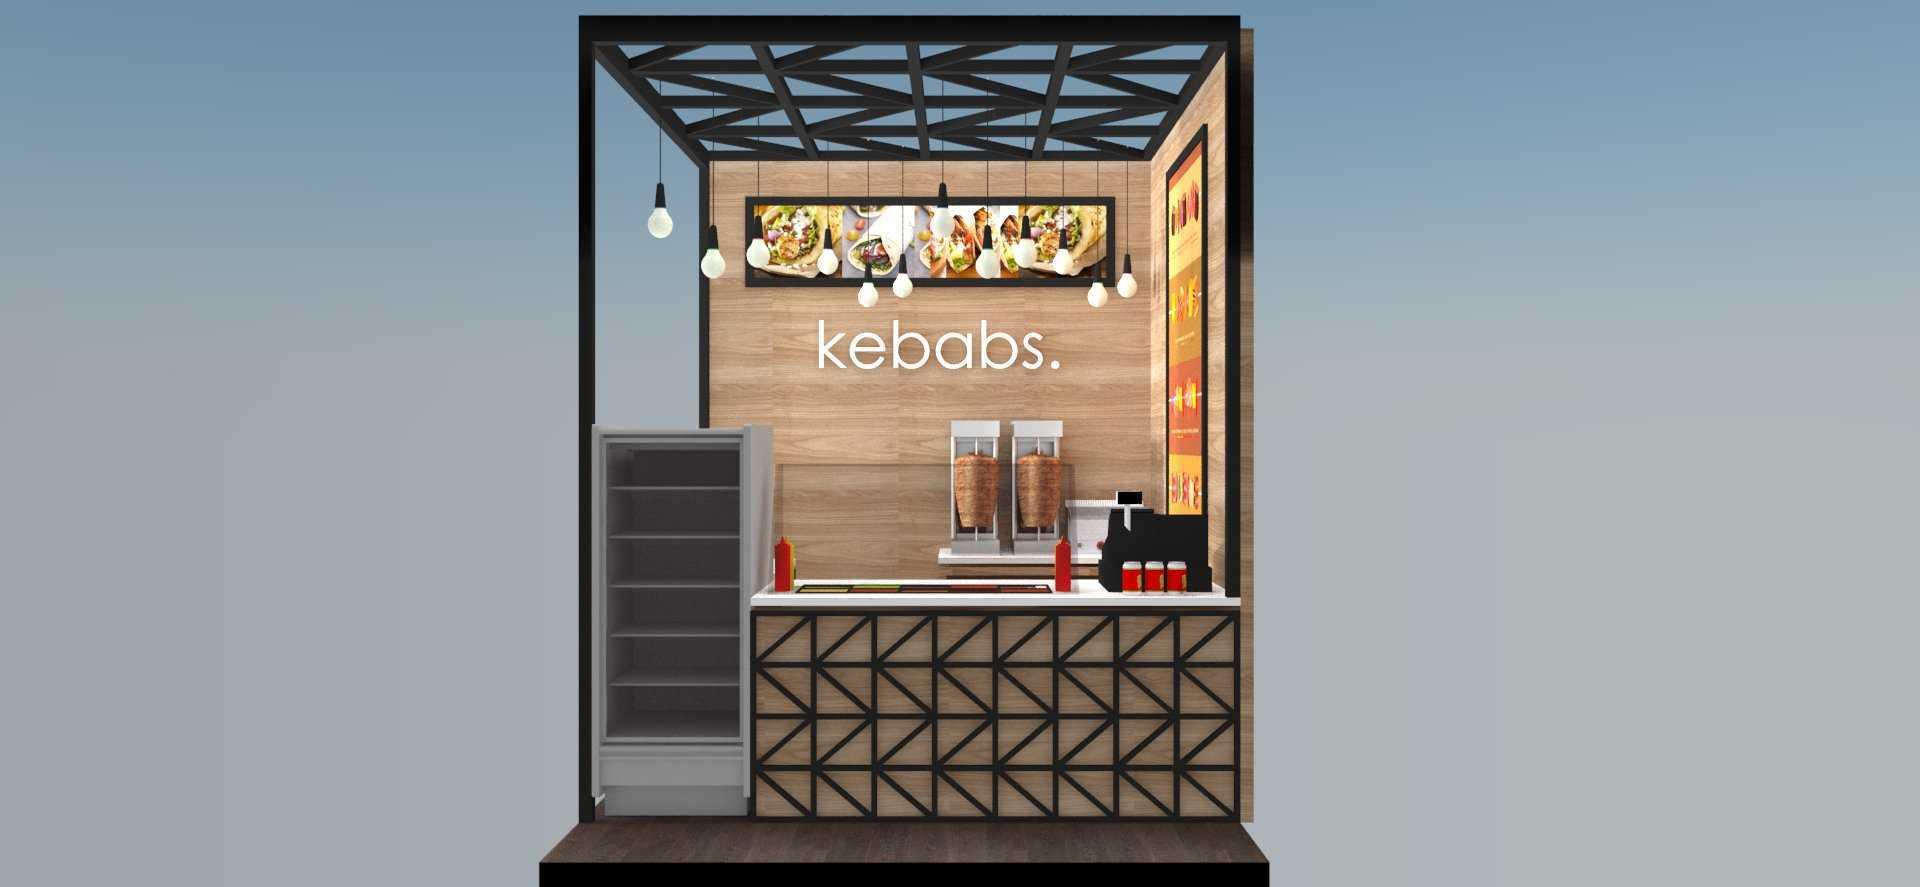 Virr Studio Kabob Premium Kebab Bandung Indah Plaza Citarum, Bandung Wetan, Bandung City, West Java 40117, Indonesia Citarum, Bandung Wetan, Bandung City, West Java 40117, Indonesia 01 Industrial,kontemporer,modern  36249